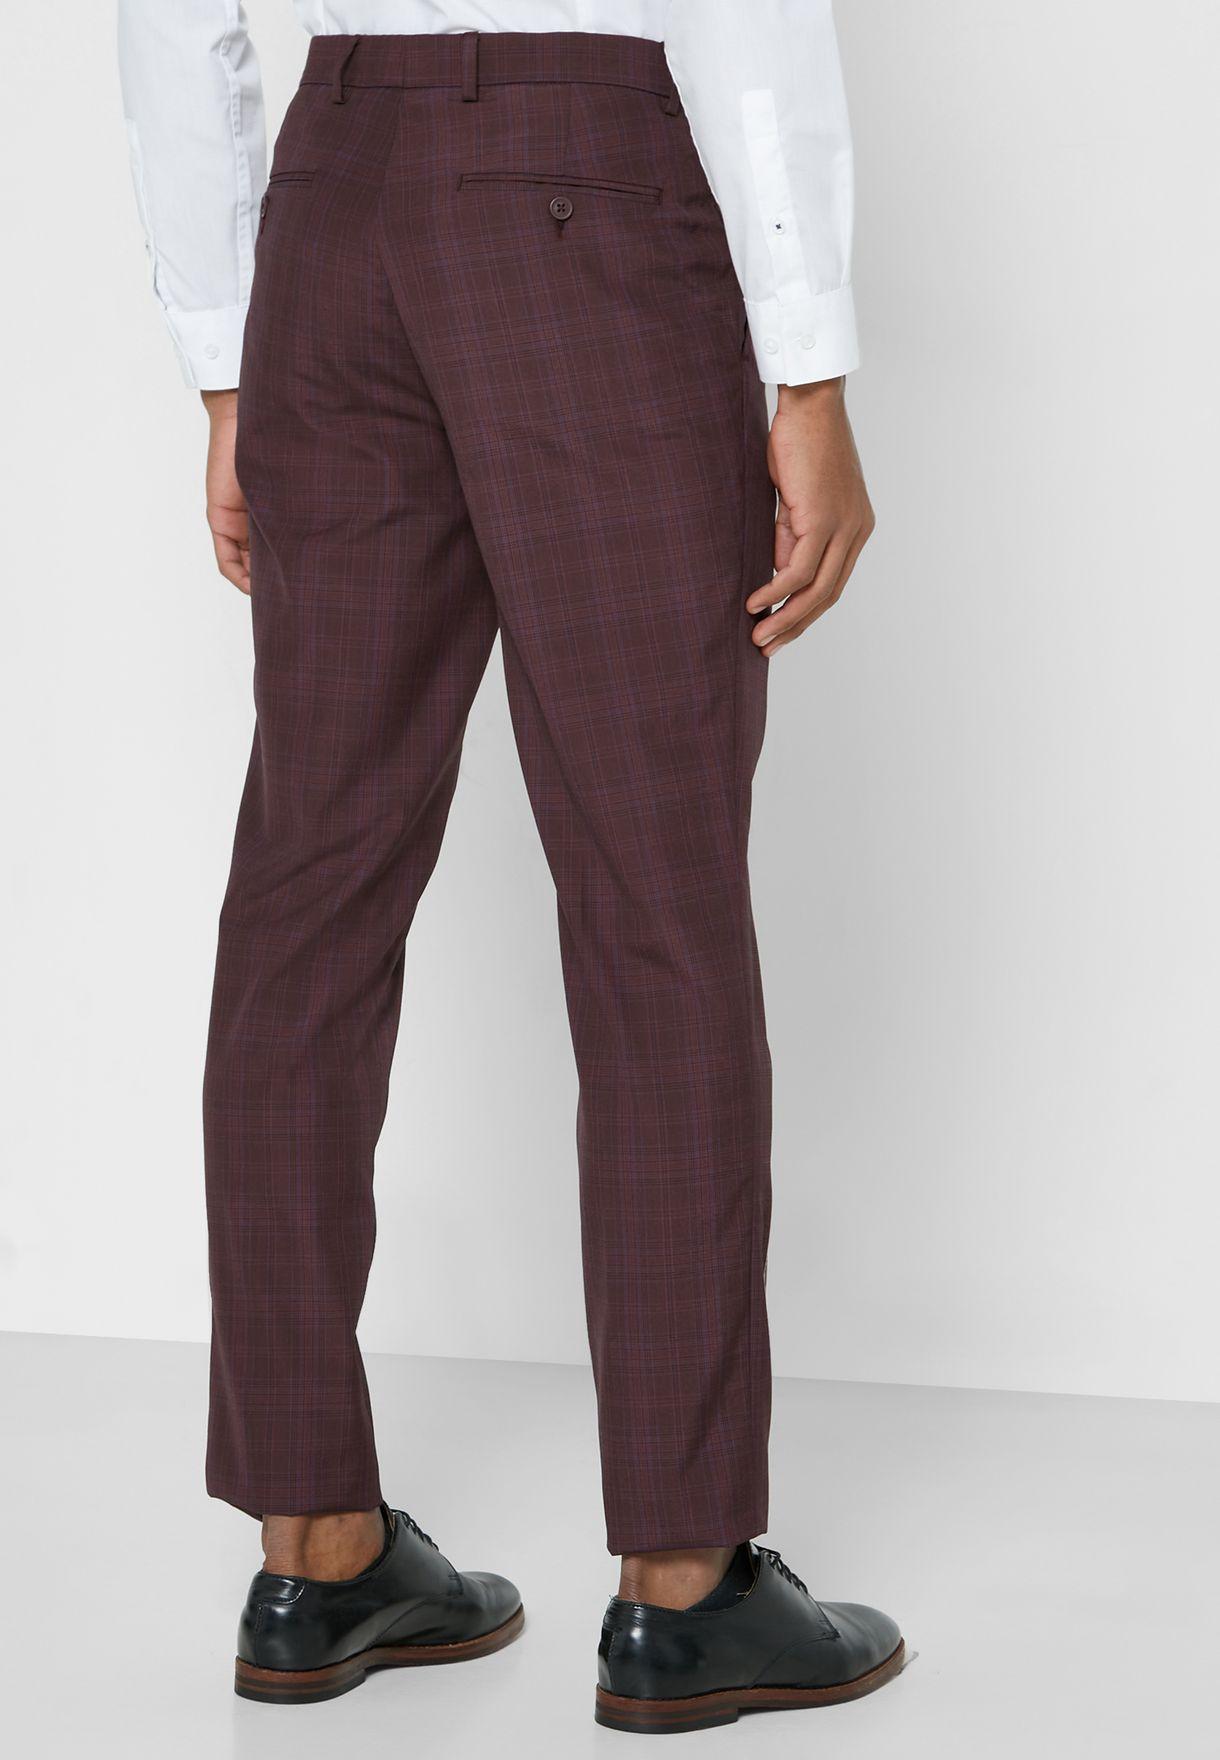 Casual Slim Fit Pants